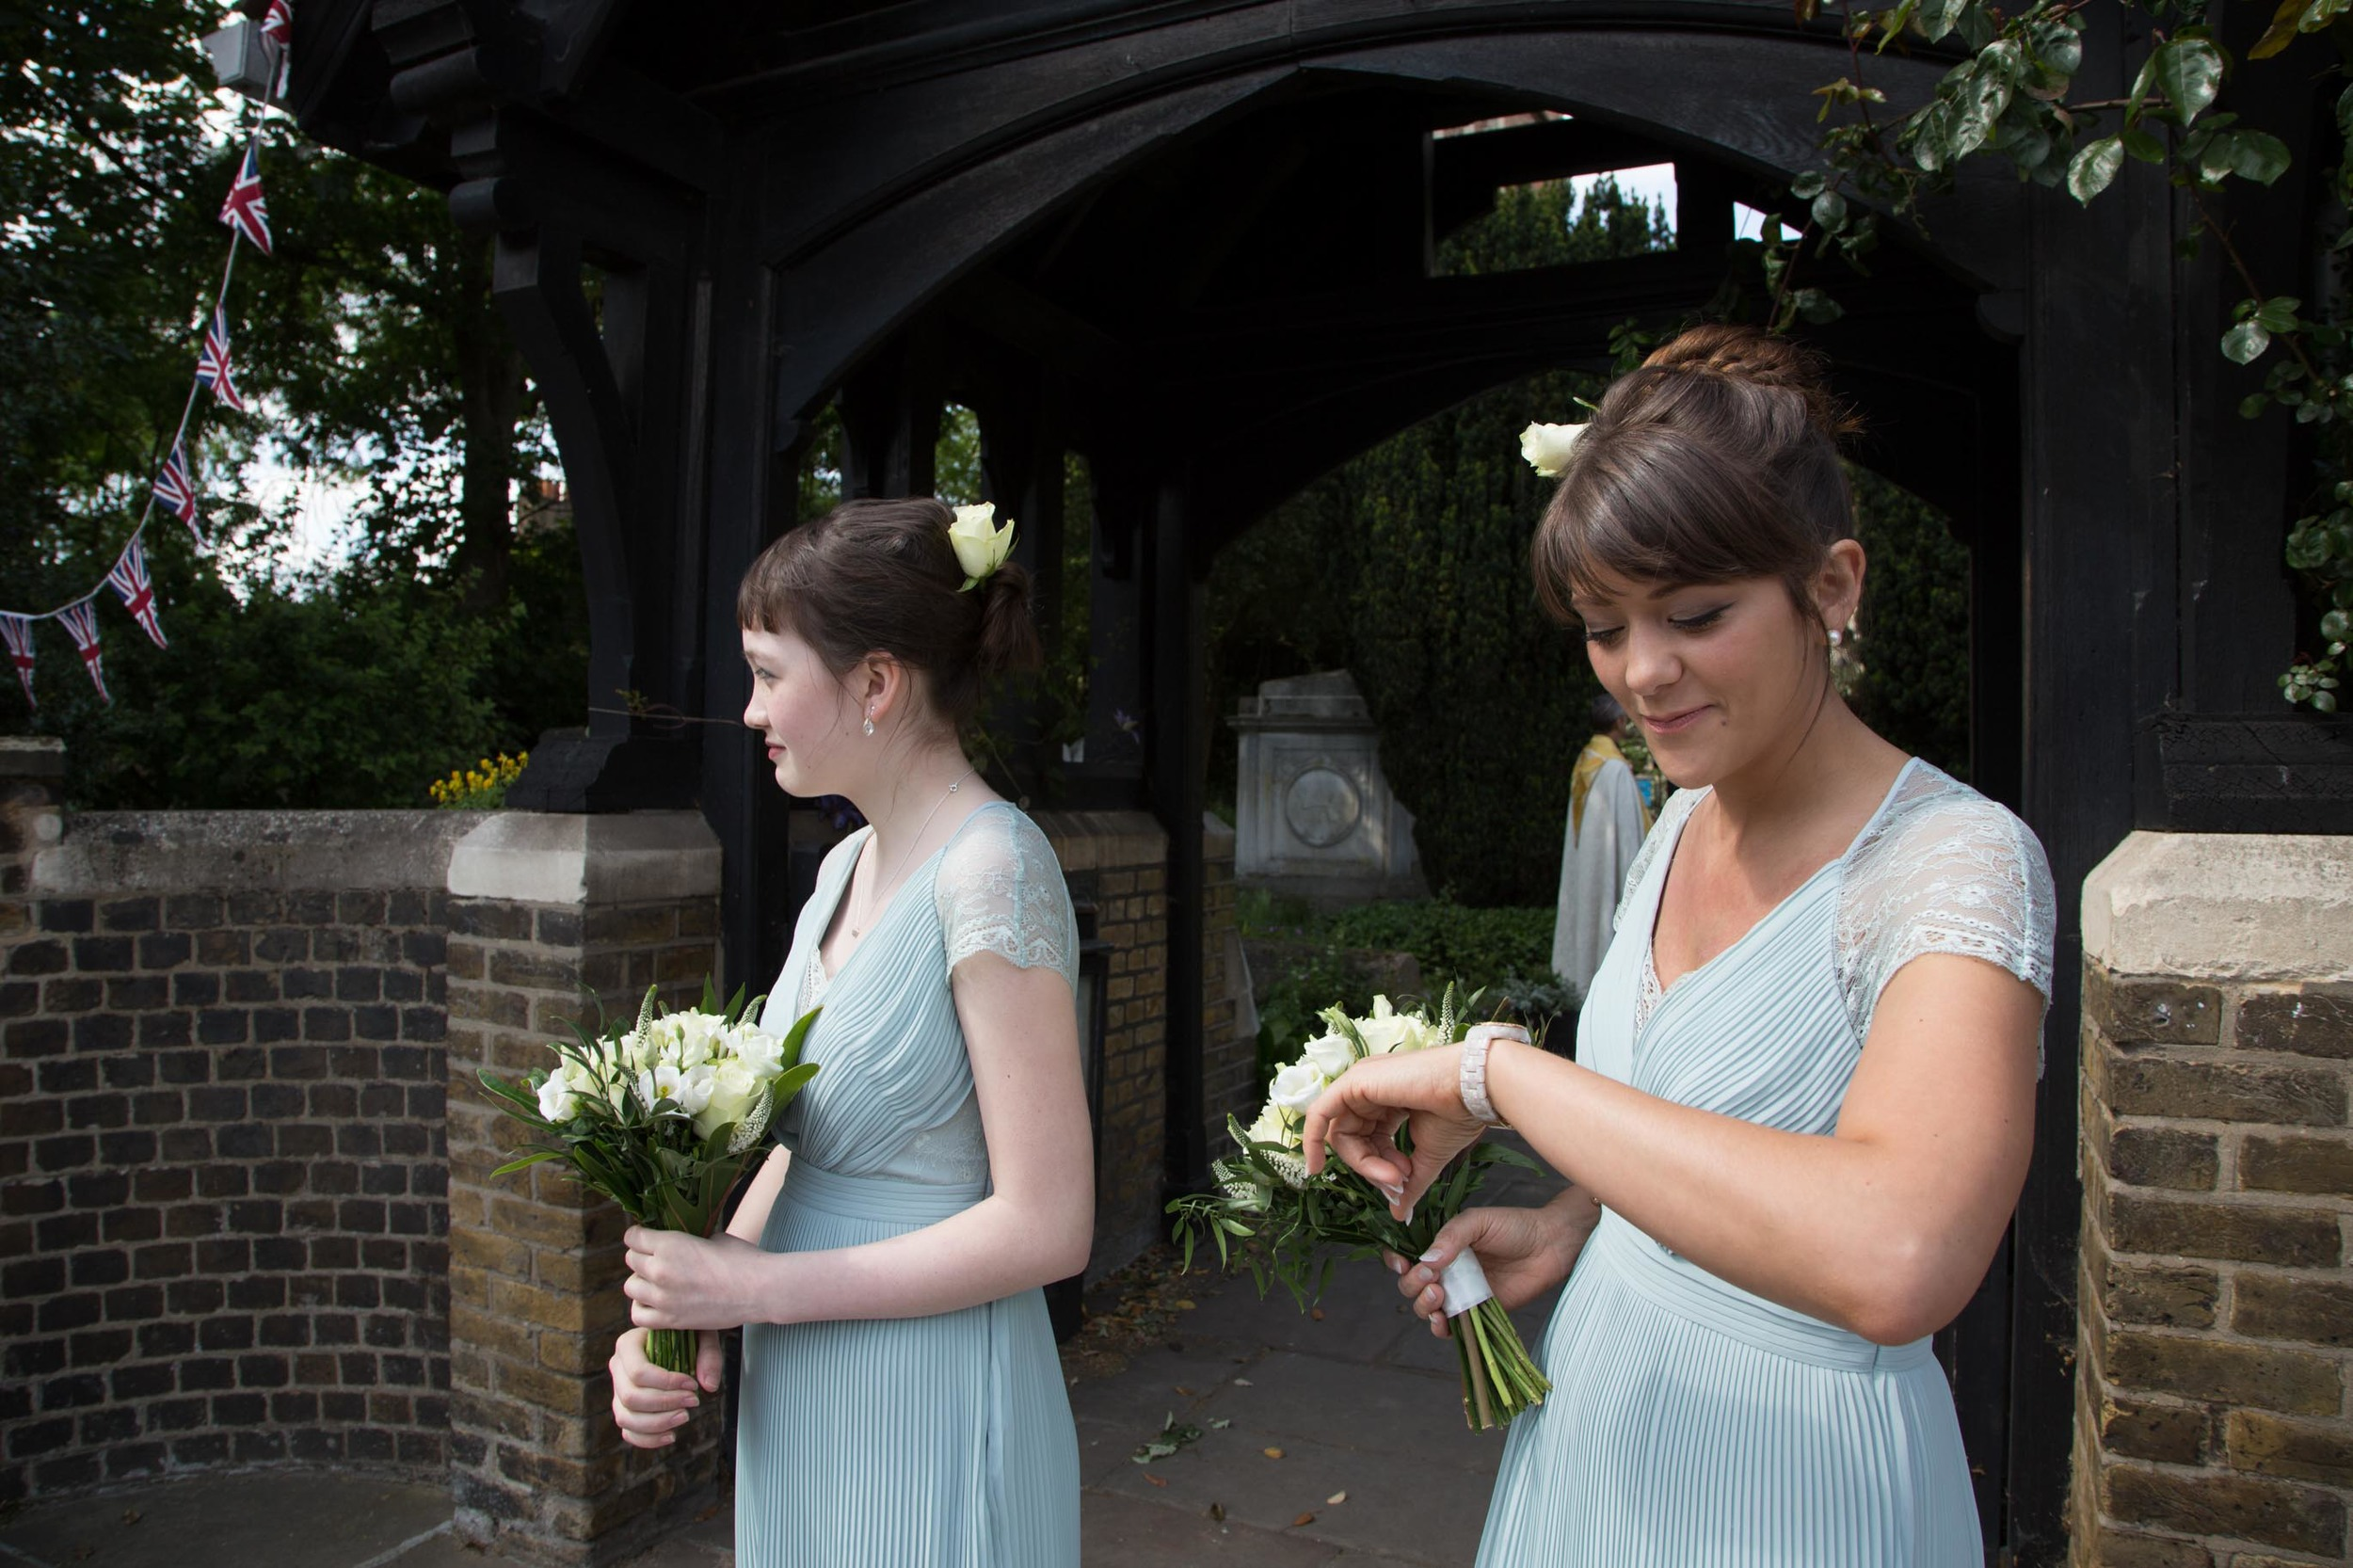 barnes-wedding-adam-rowley-photographer-bridesmaids-late